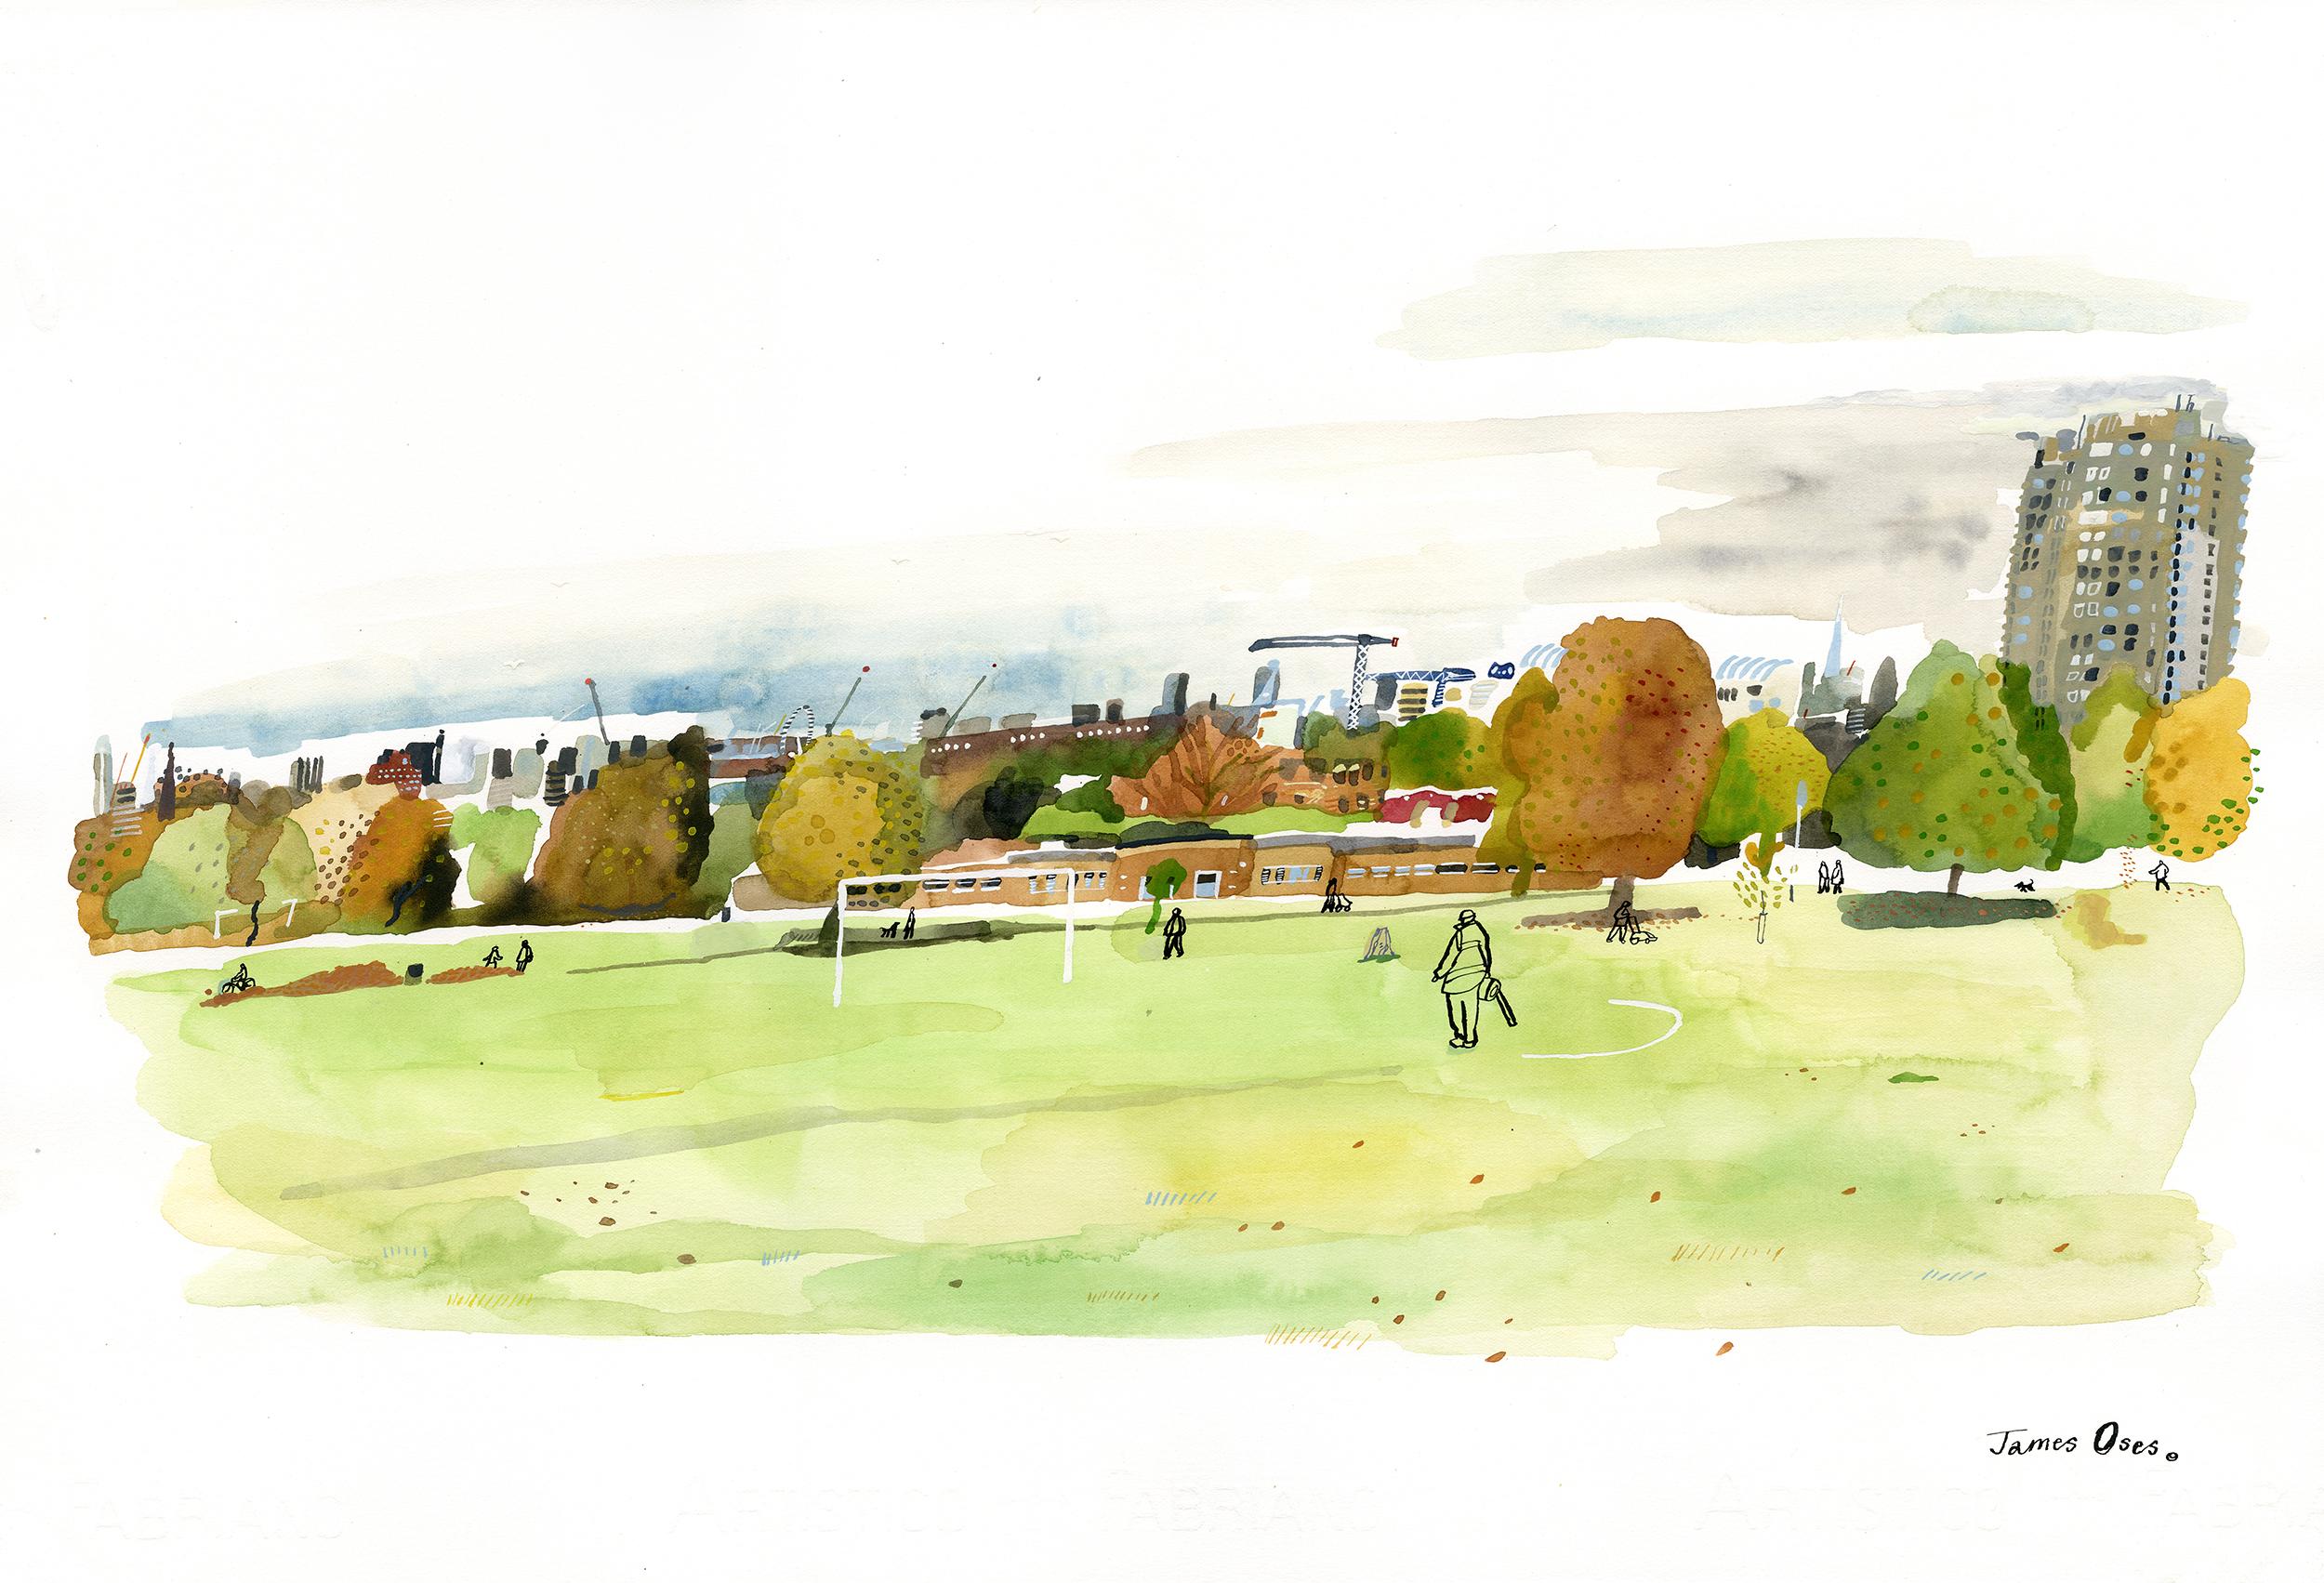 Autumn-in-Brockwell-Park-James-Oses.jpg